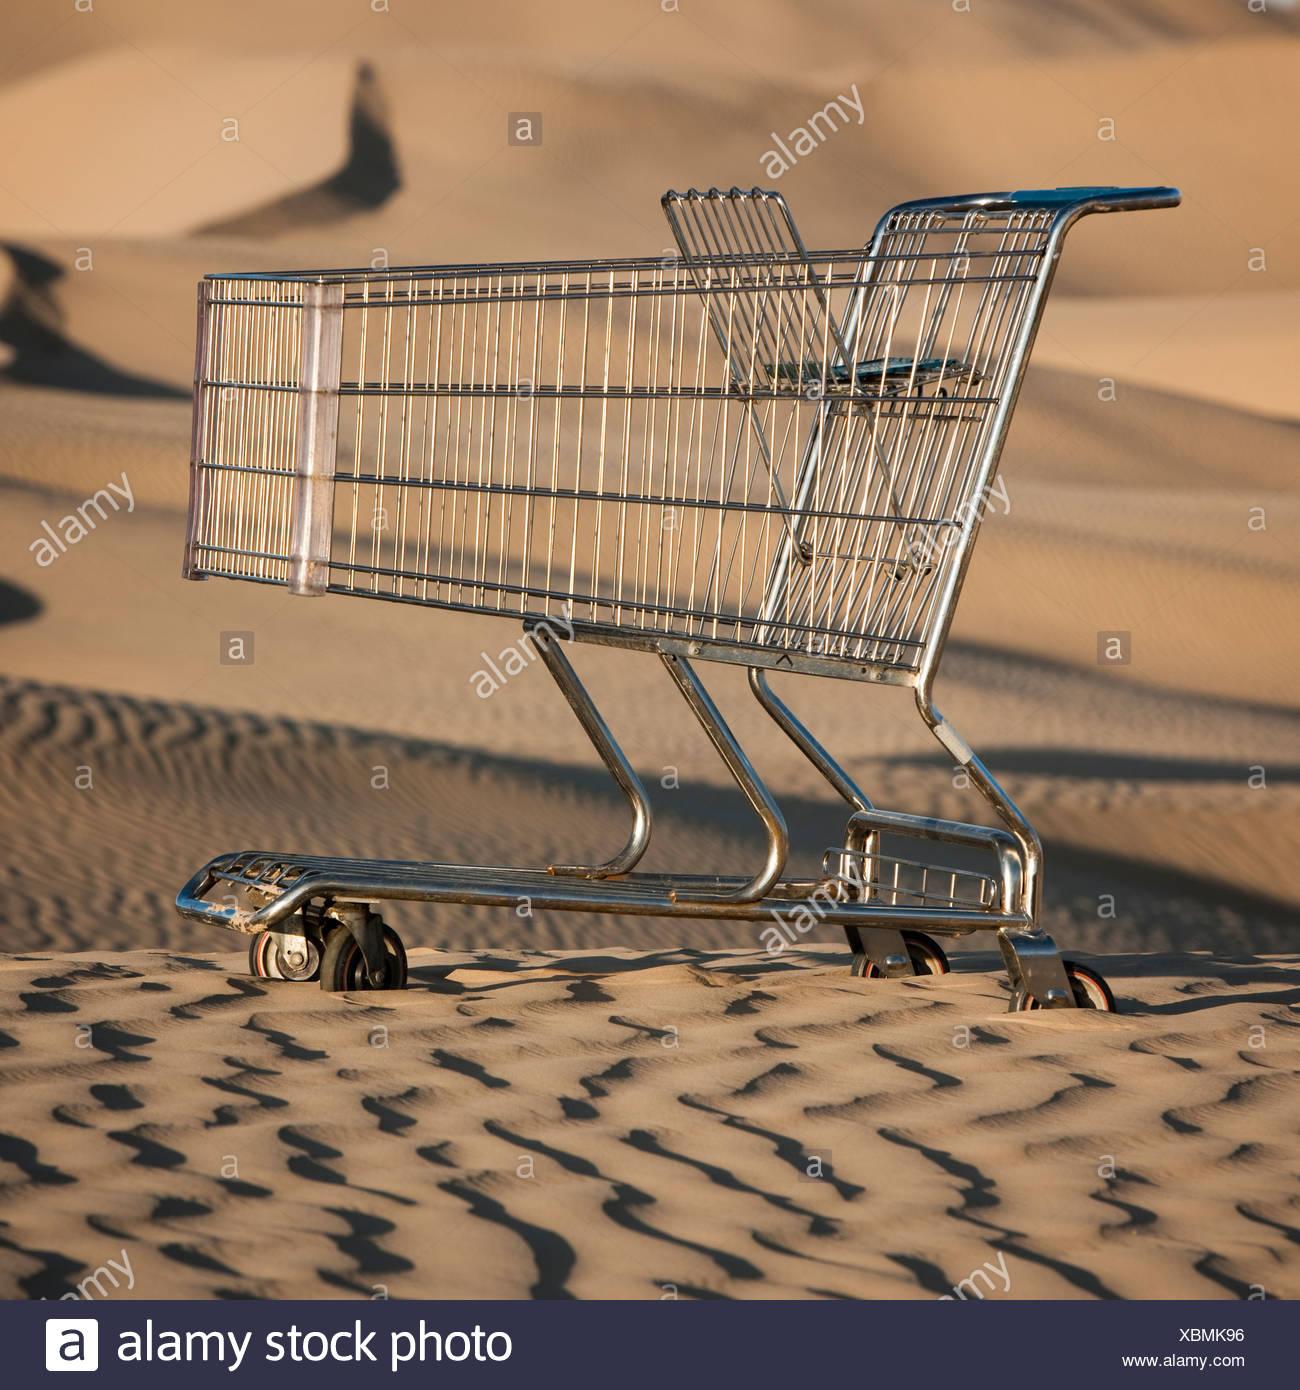 USA, Utah, little Sahara, chariot d'achat abandonné sur desert Photo Stock